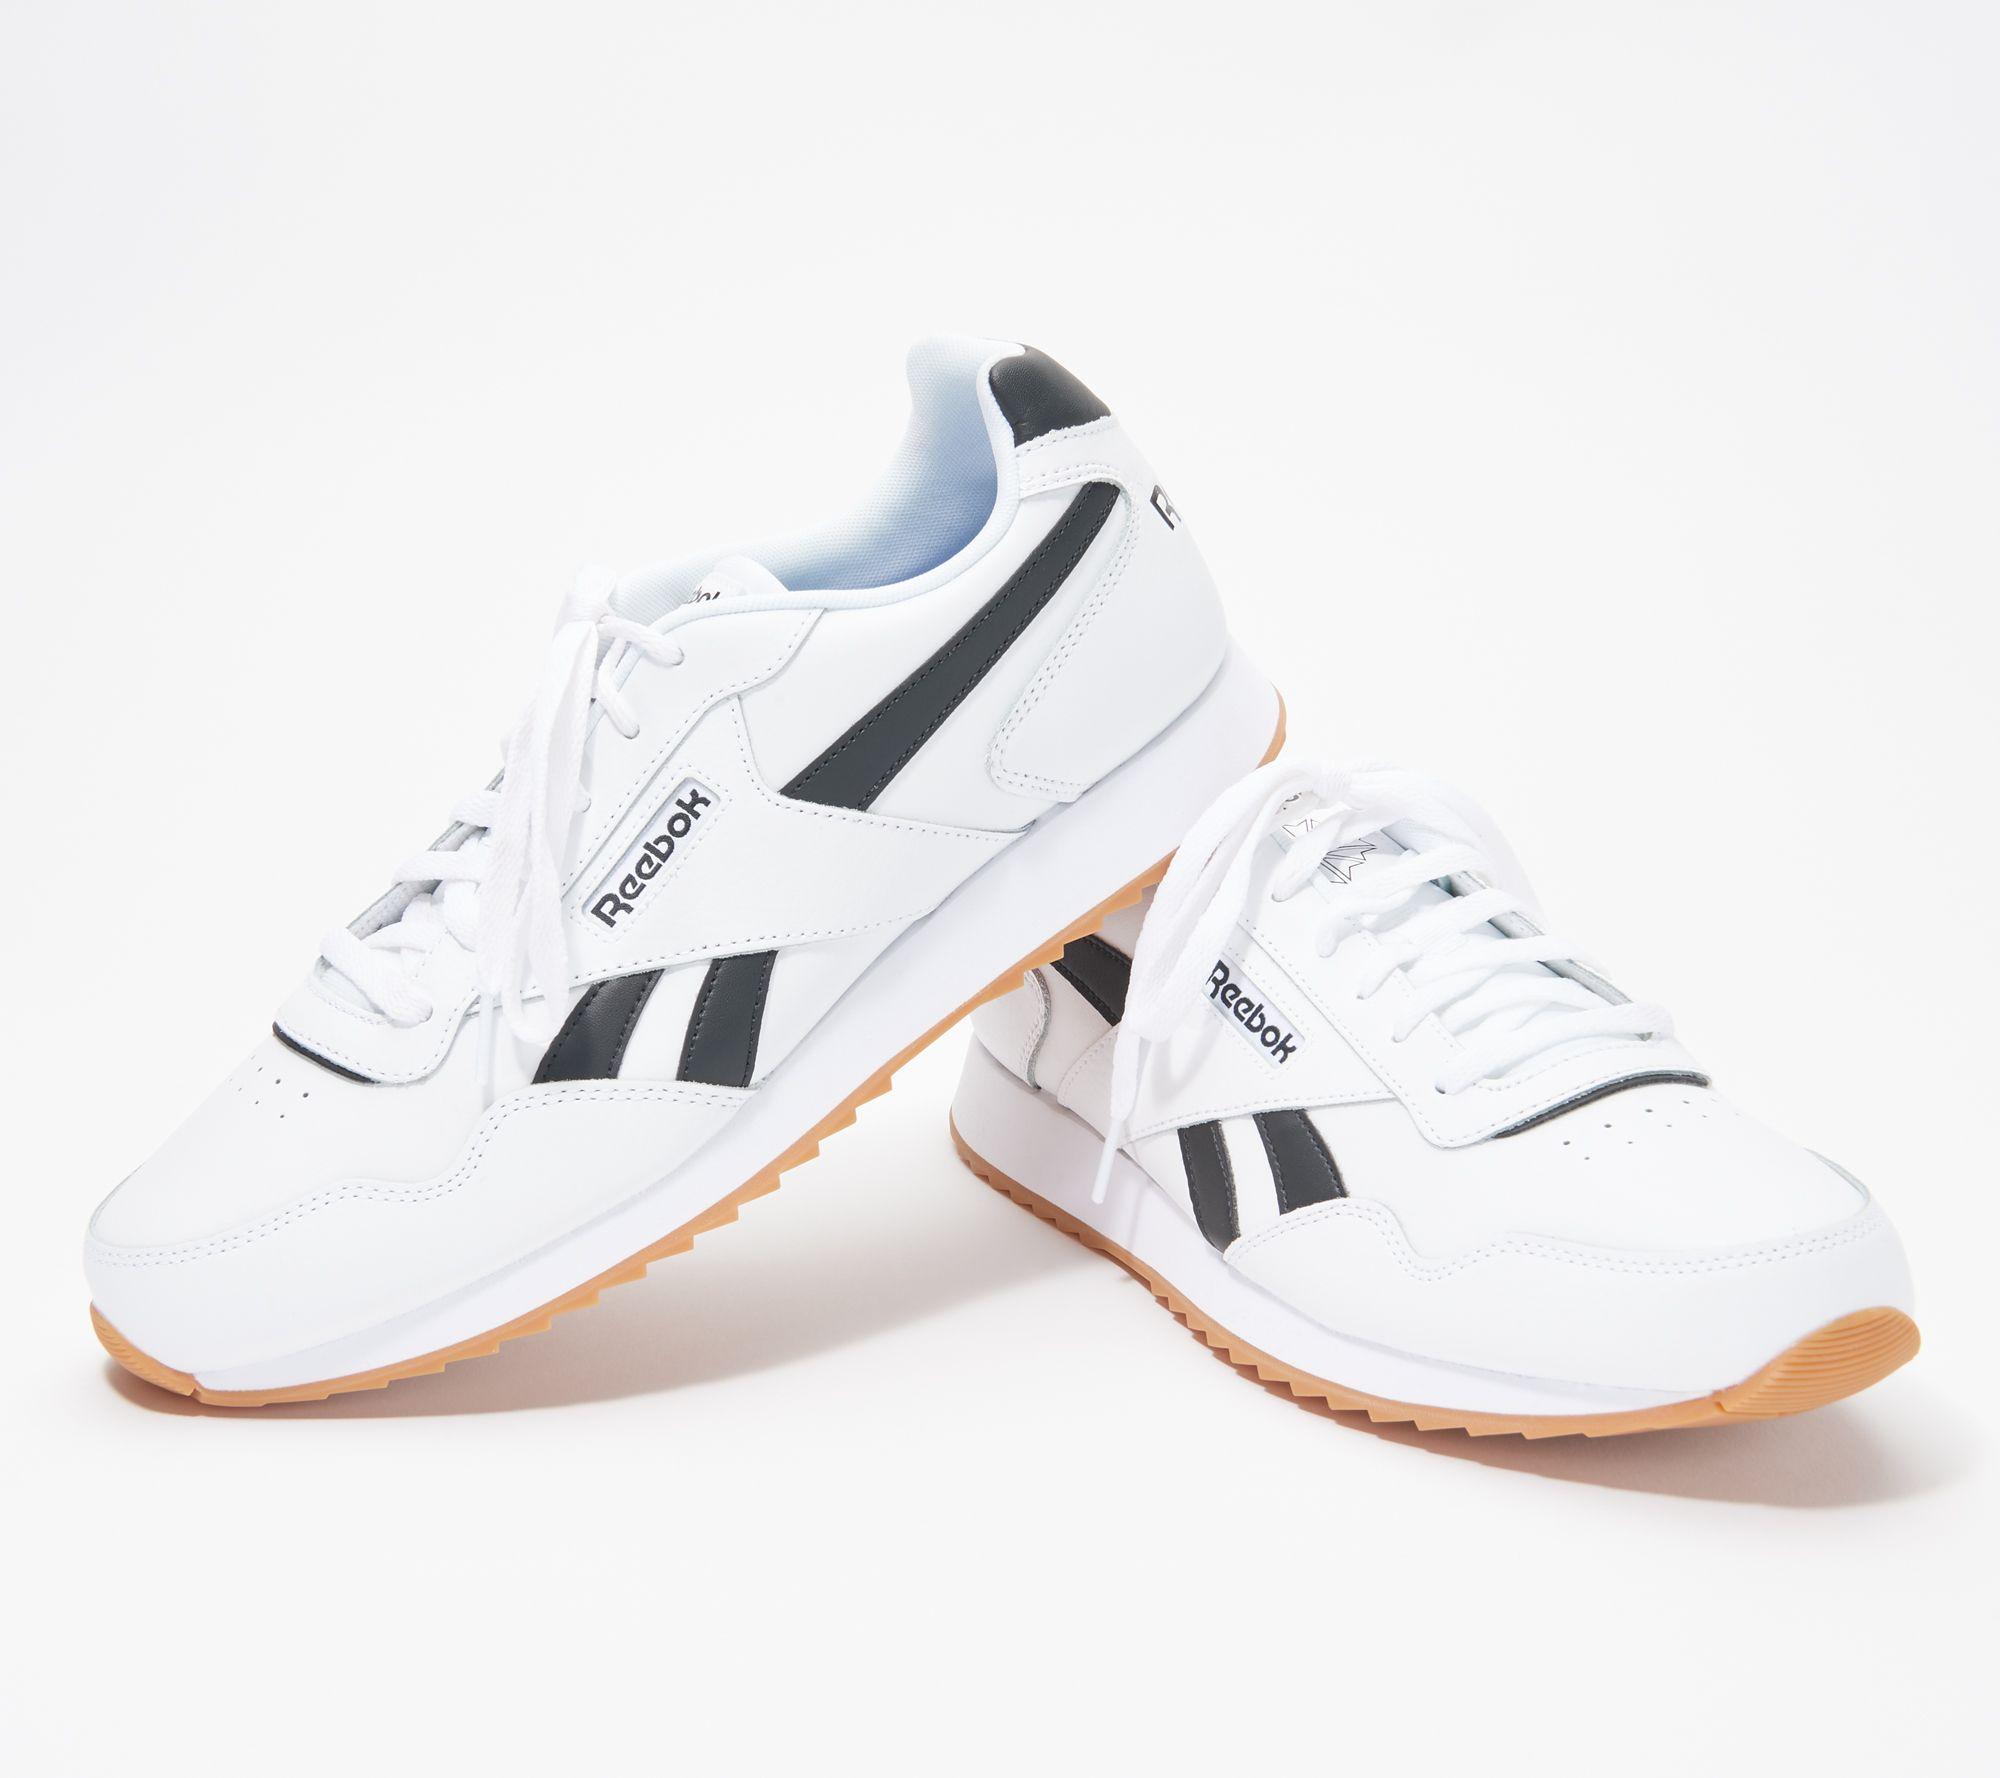 pretty nice 7ada3 8f847 Reebok Men's Classics Lace-Up Sneaker - Harman Run — QVC.com